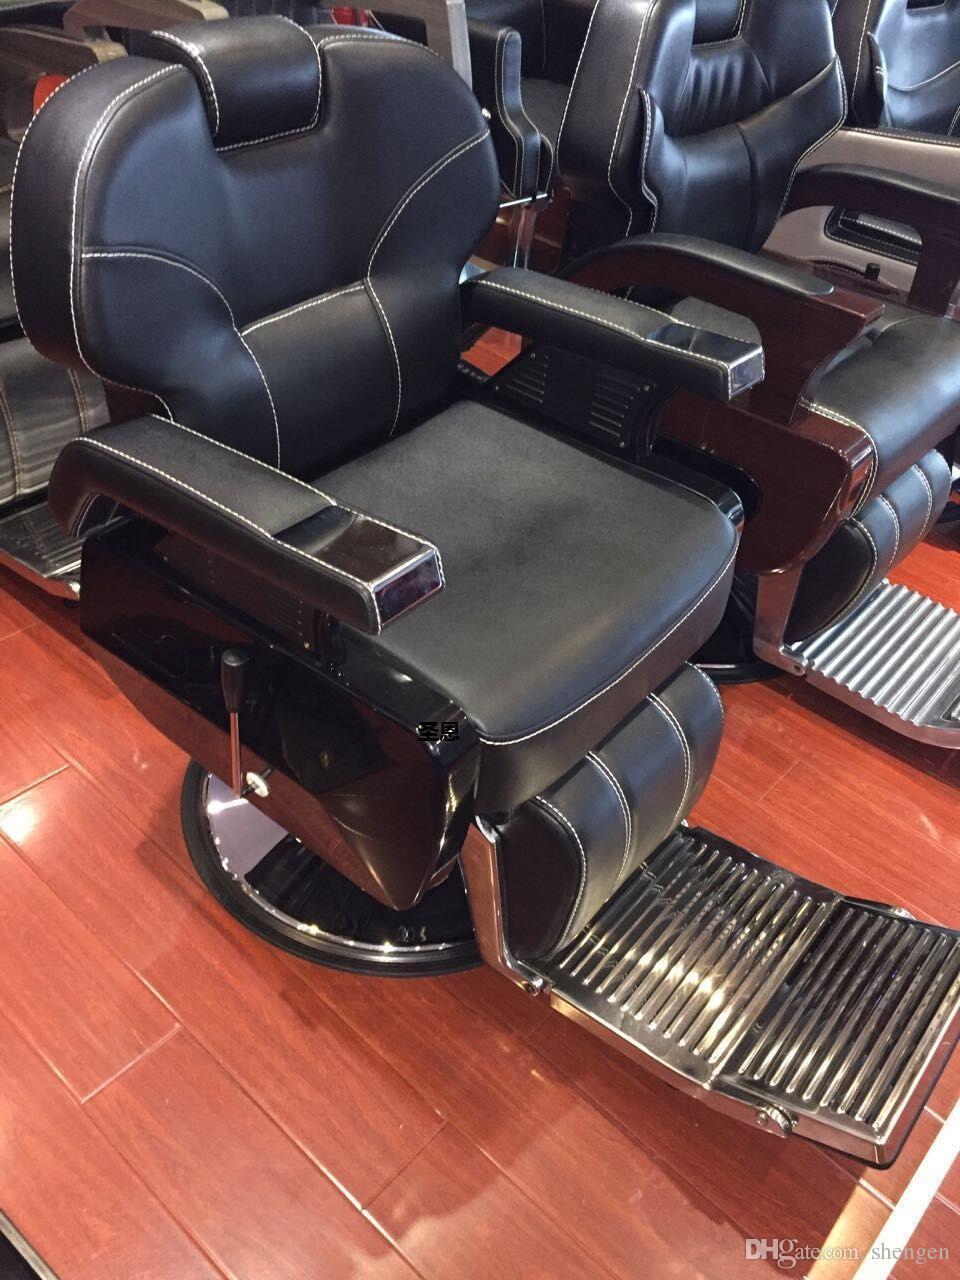 2017 barber chair salon furniture salon equipment barber for Salon equipment for sale cheap